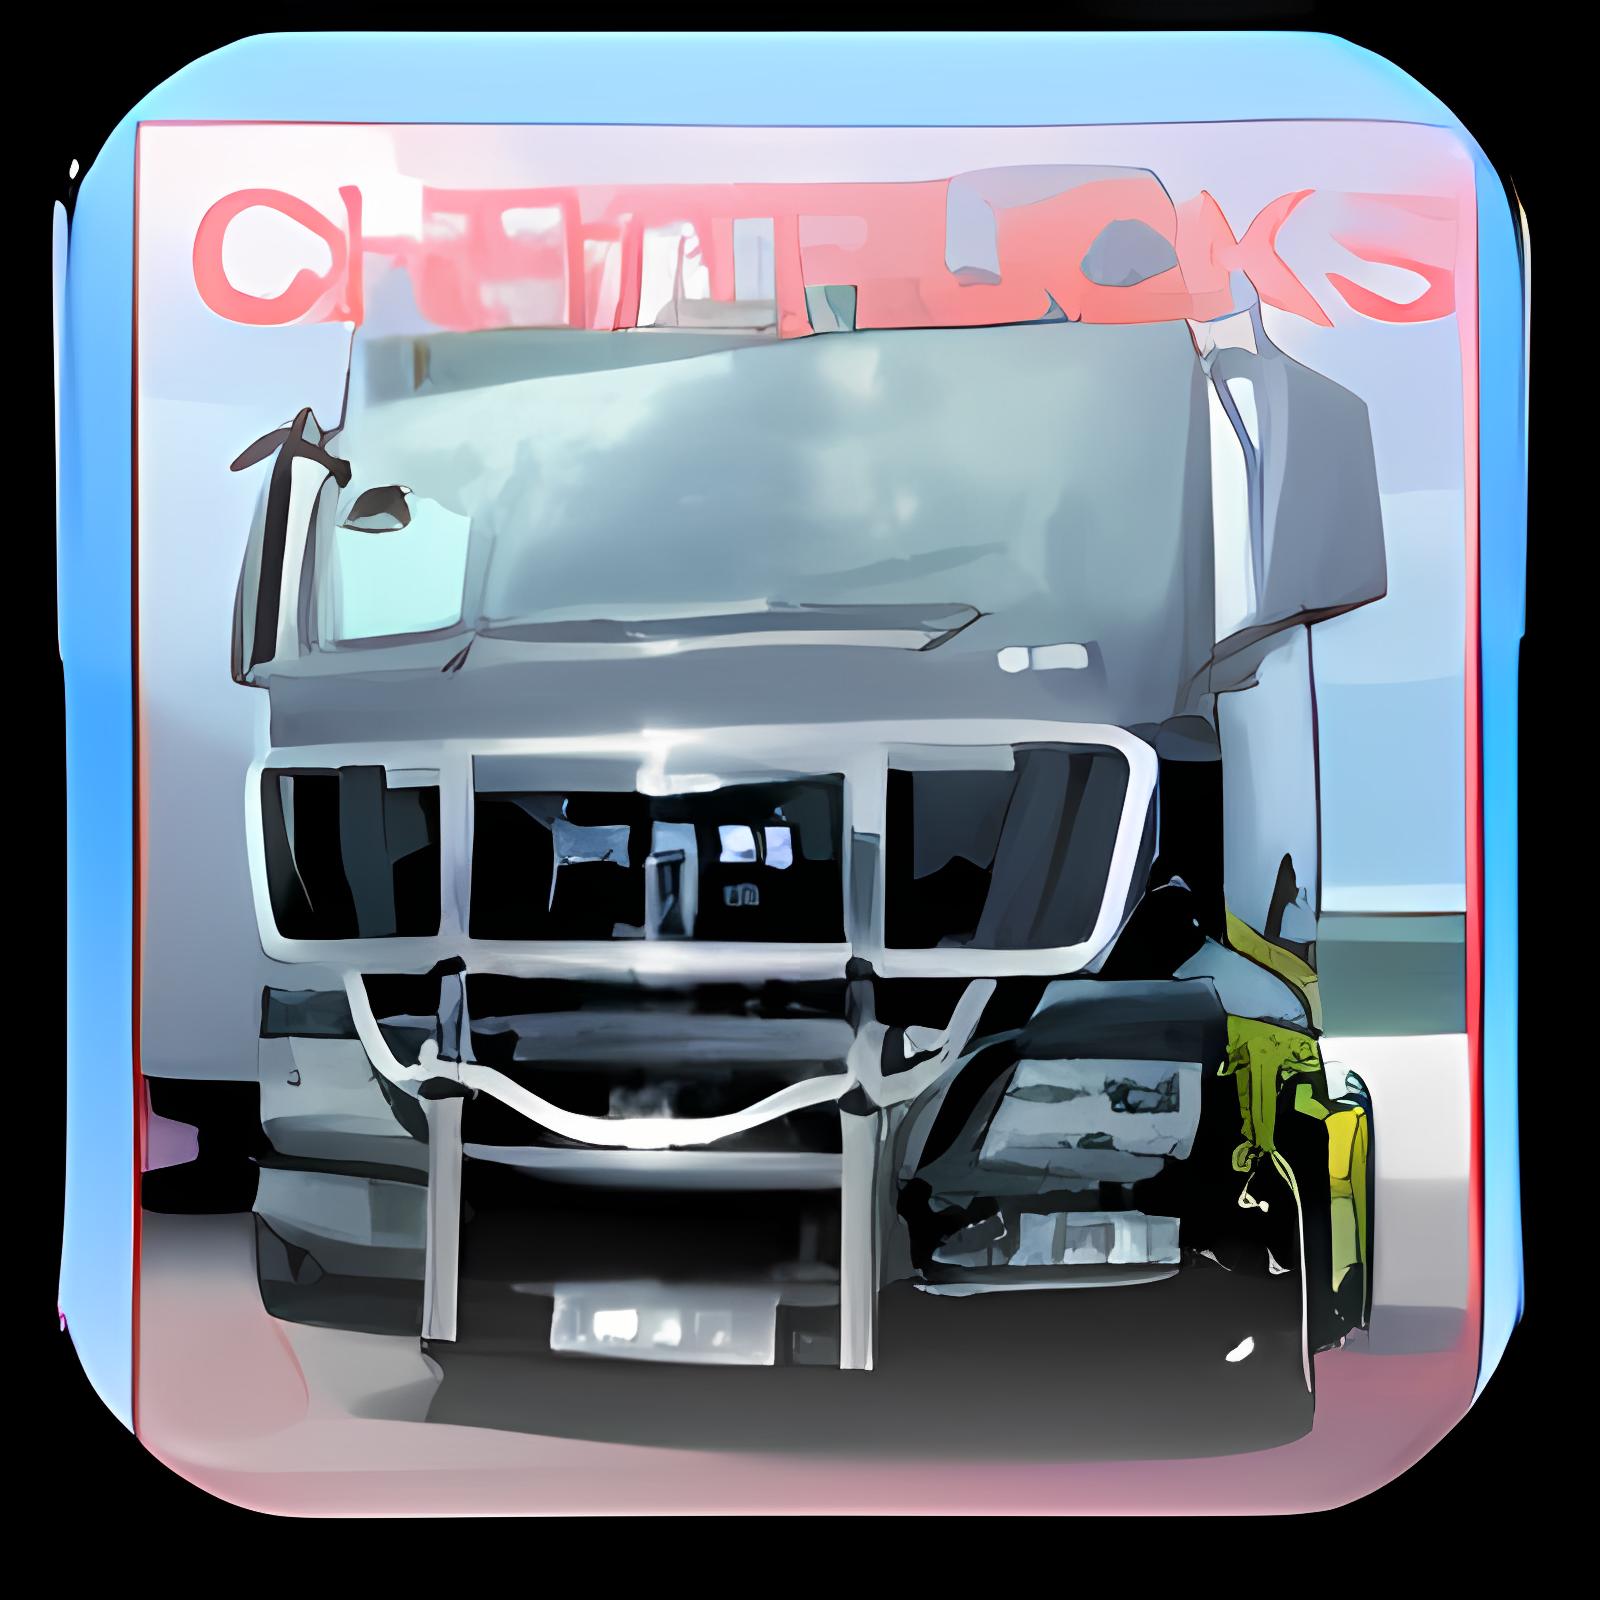 Euro Truck Simulator 2 No Speed Limit mod